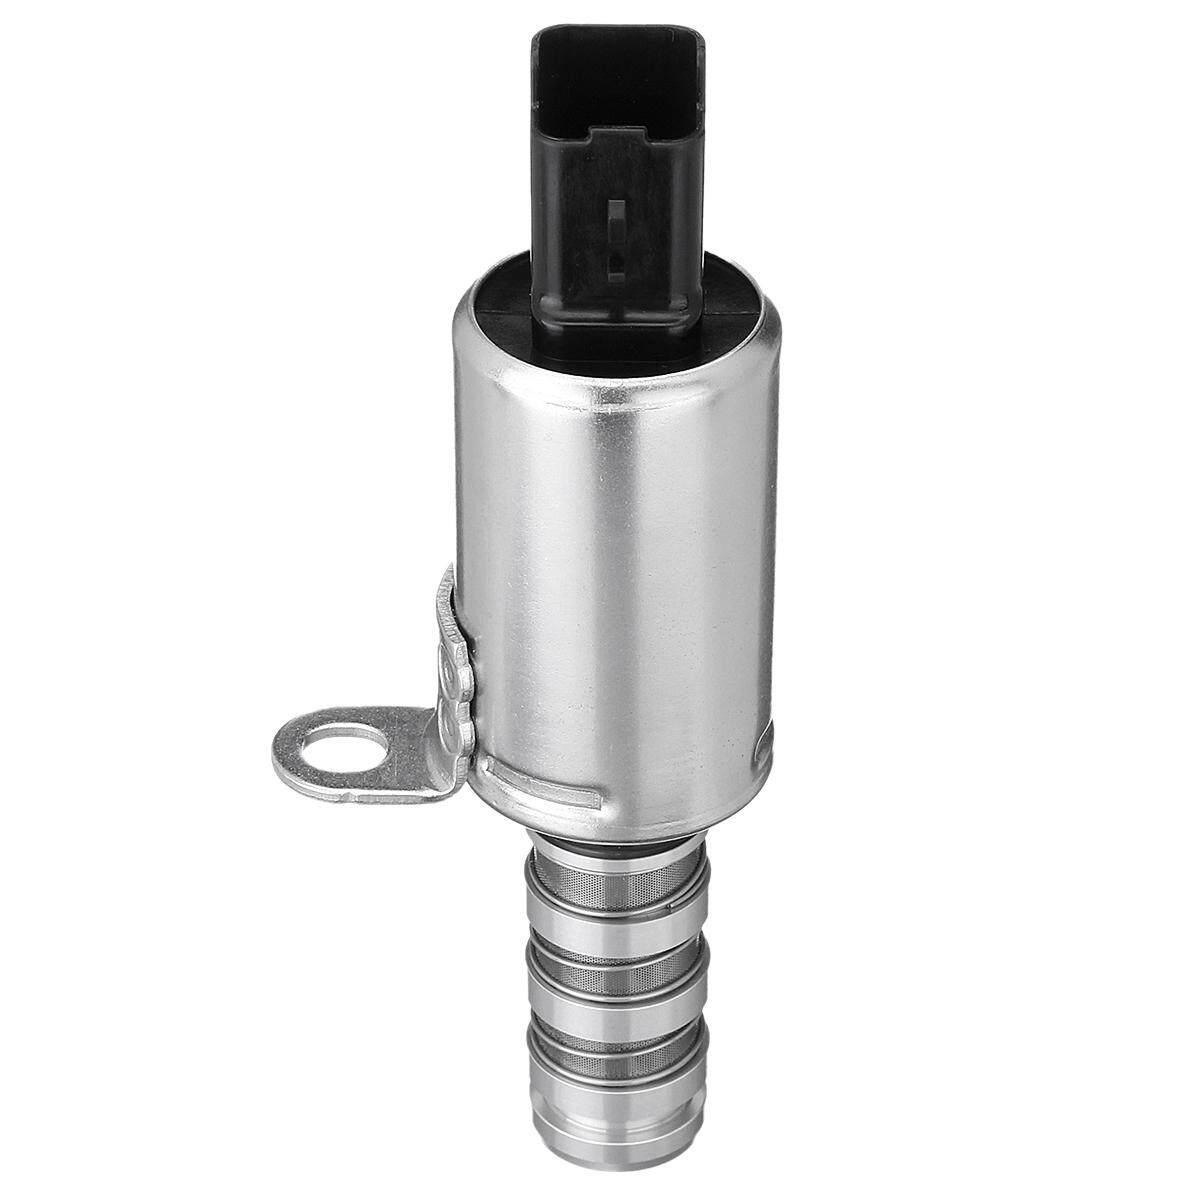 Timing Belt For Sale Car Online Brands Prices On A You Control Valve Mini Citroen Peugeot N12 Engine 14 16 Intl